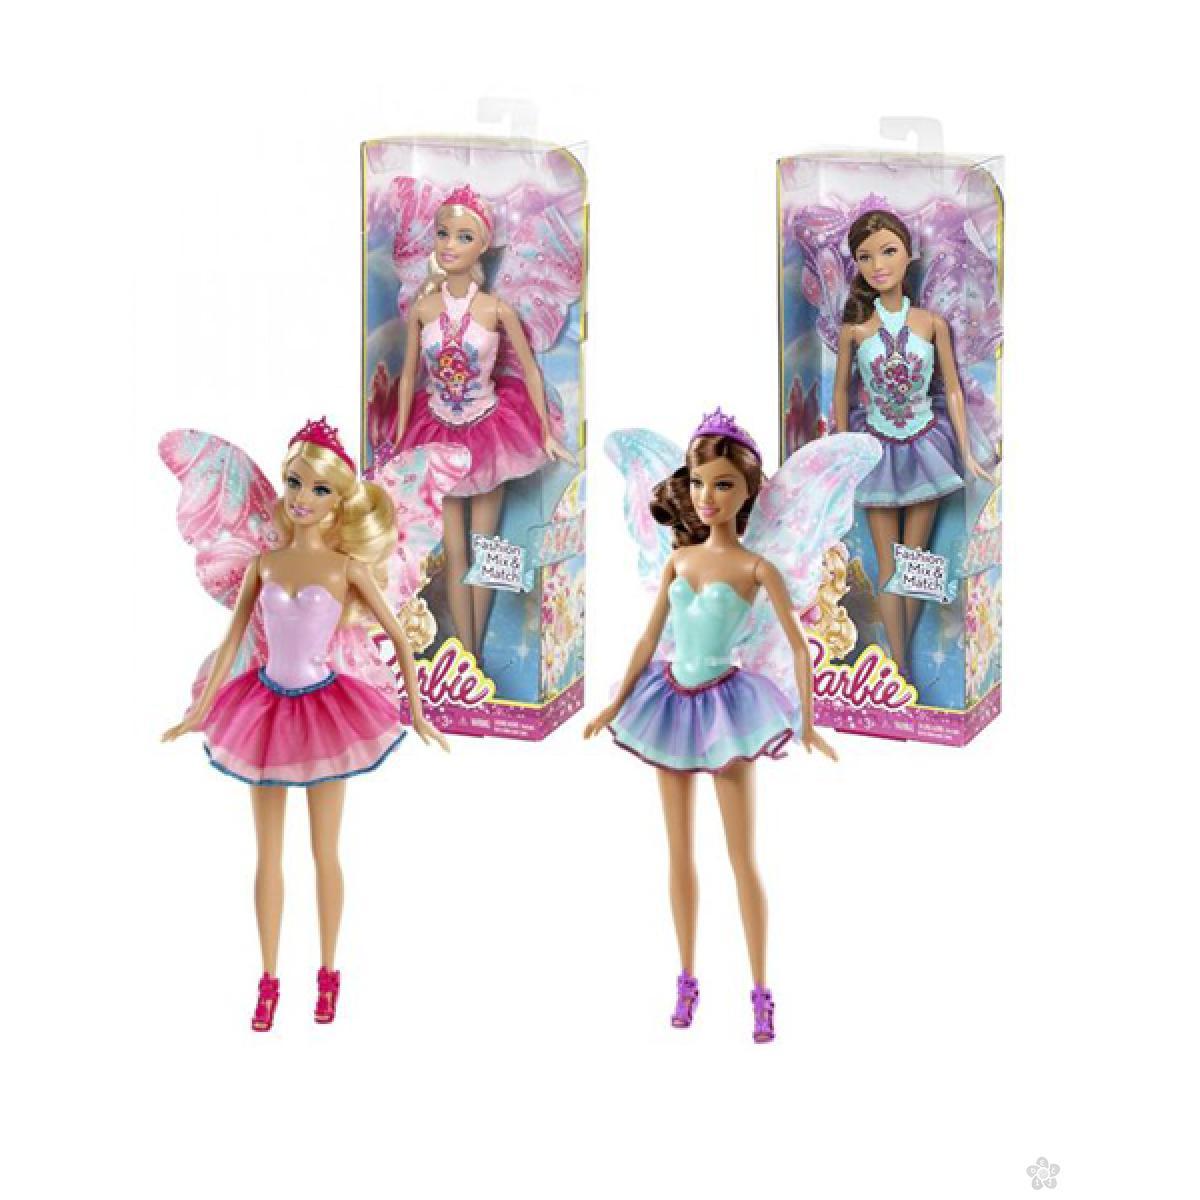 Barbie lutka vila, 446cbr13